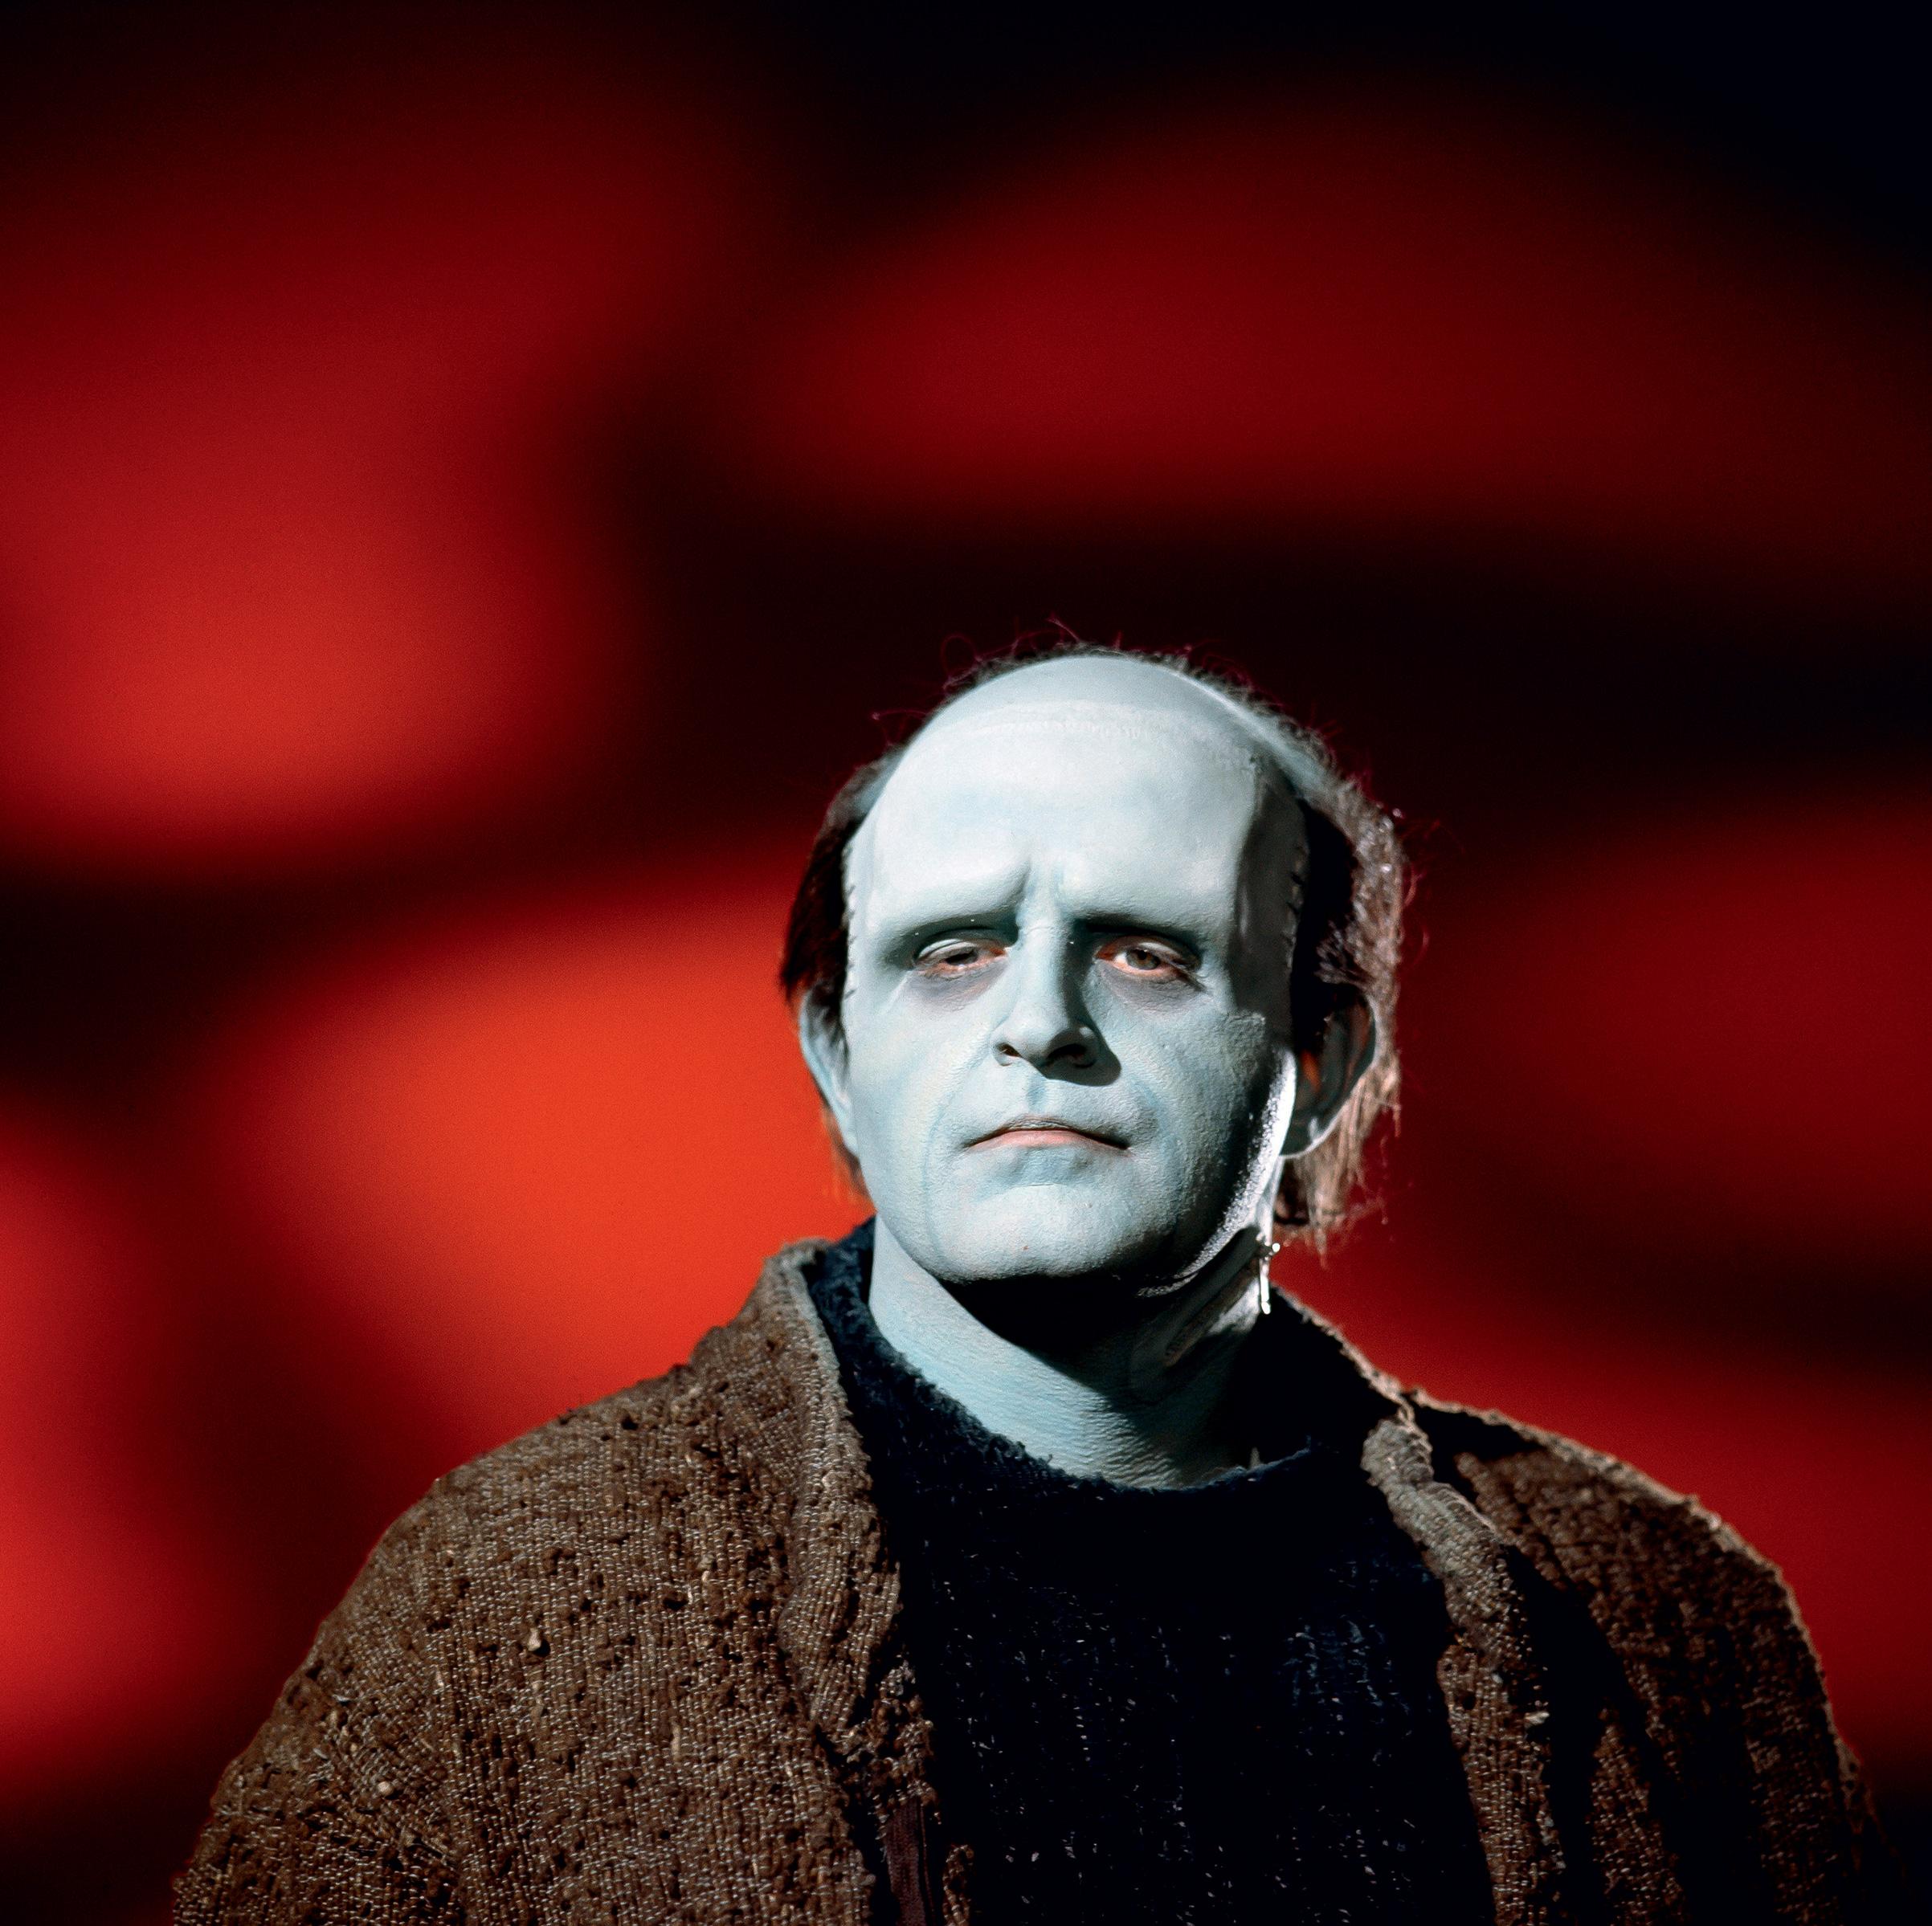 Studio Portrait of Peter Boyle as the increasingly debonair Monster in Young Frankenstein (1974).